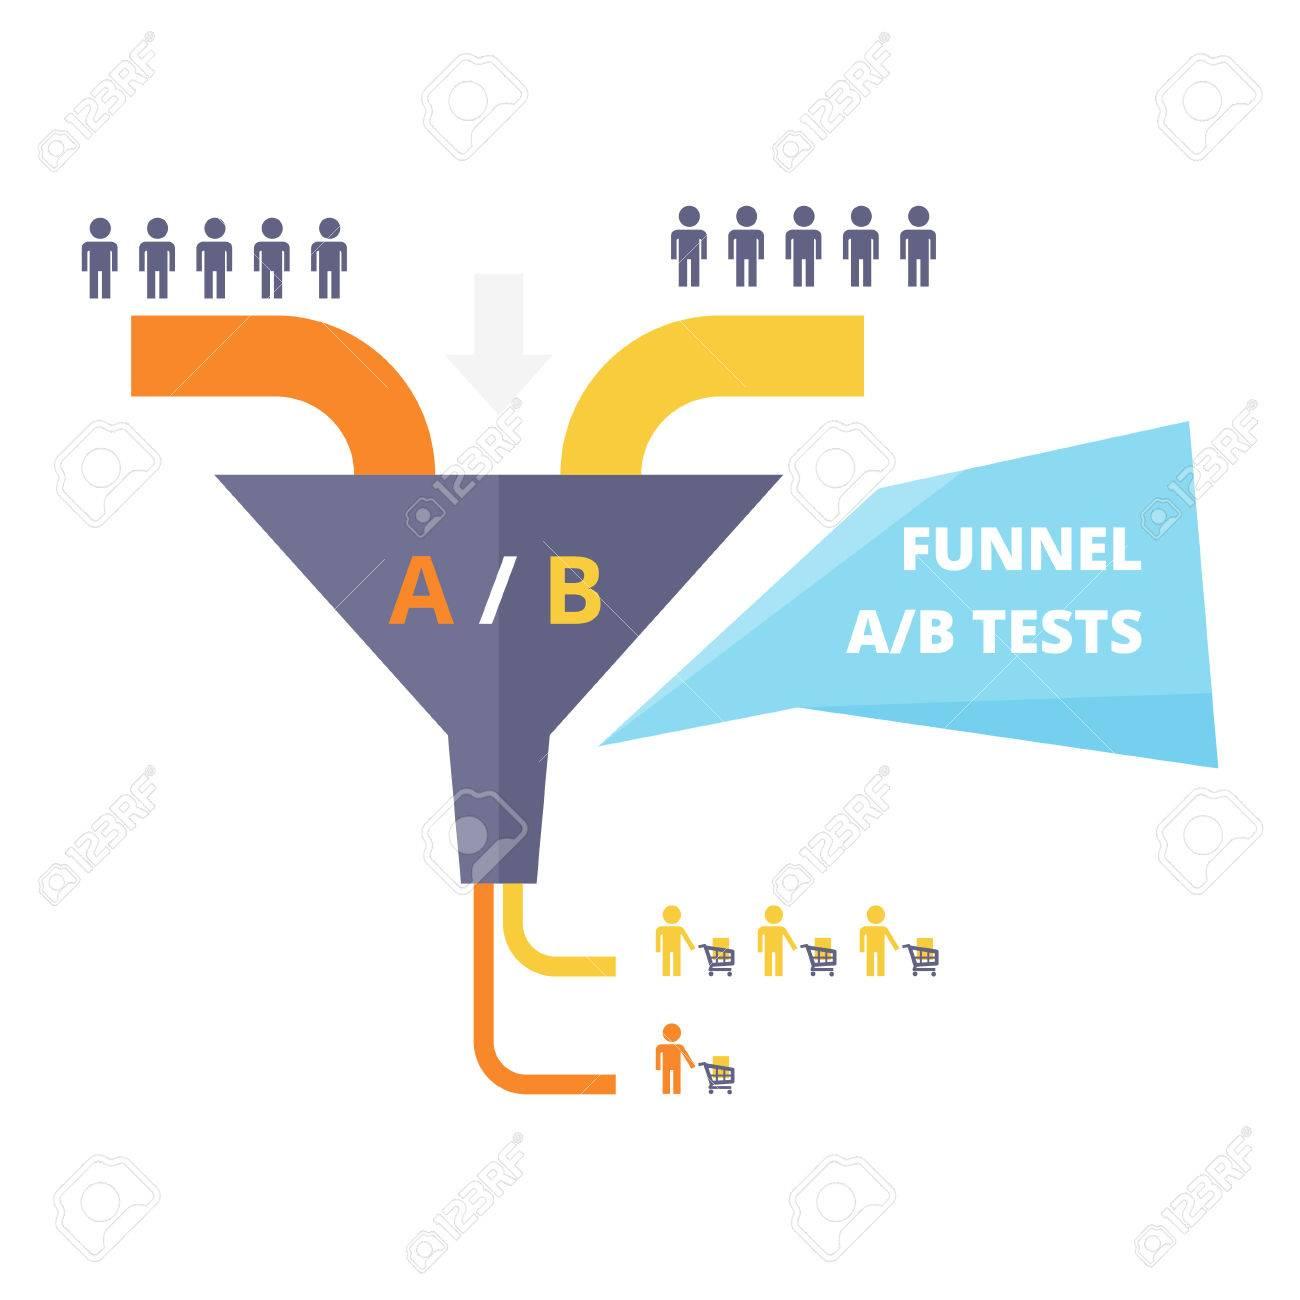 hight resolution of funnel ab test vector illustration sales funnel optimization work testing in internet marketing